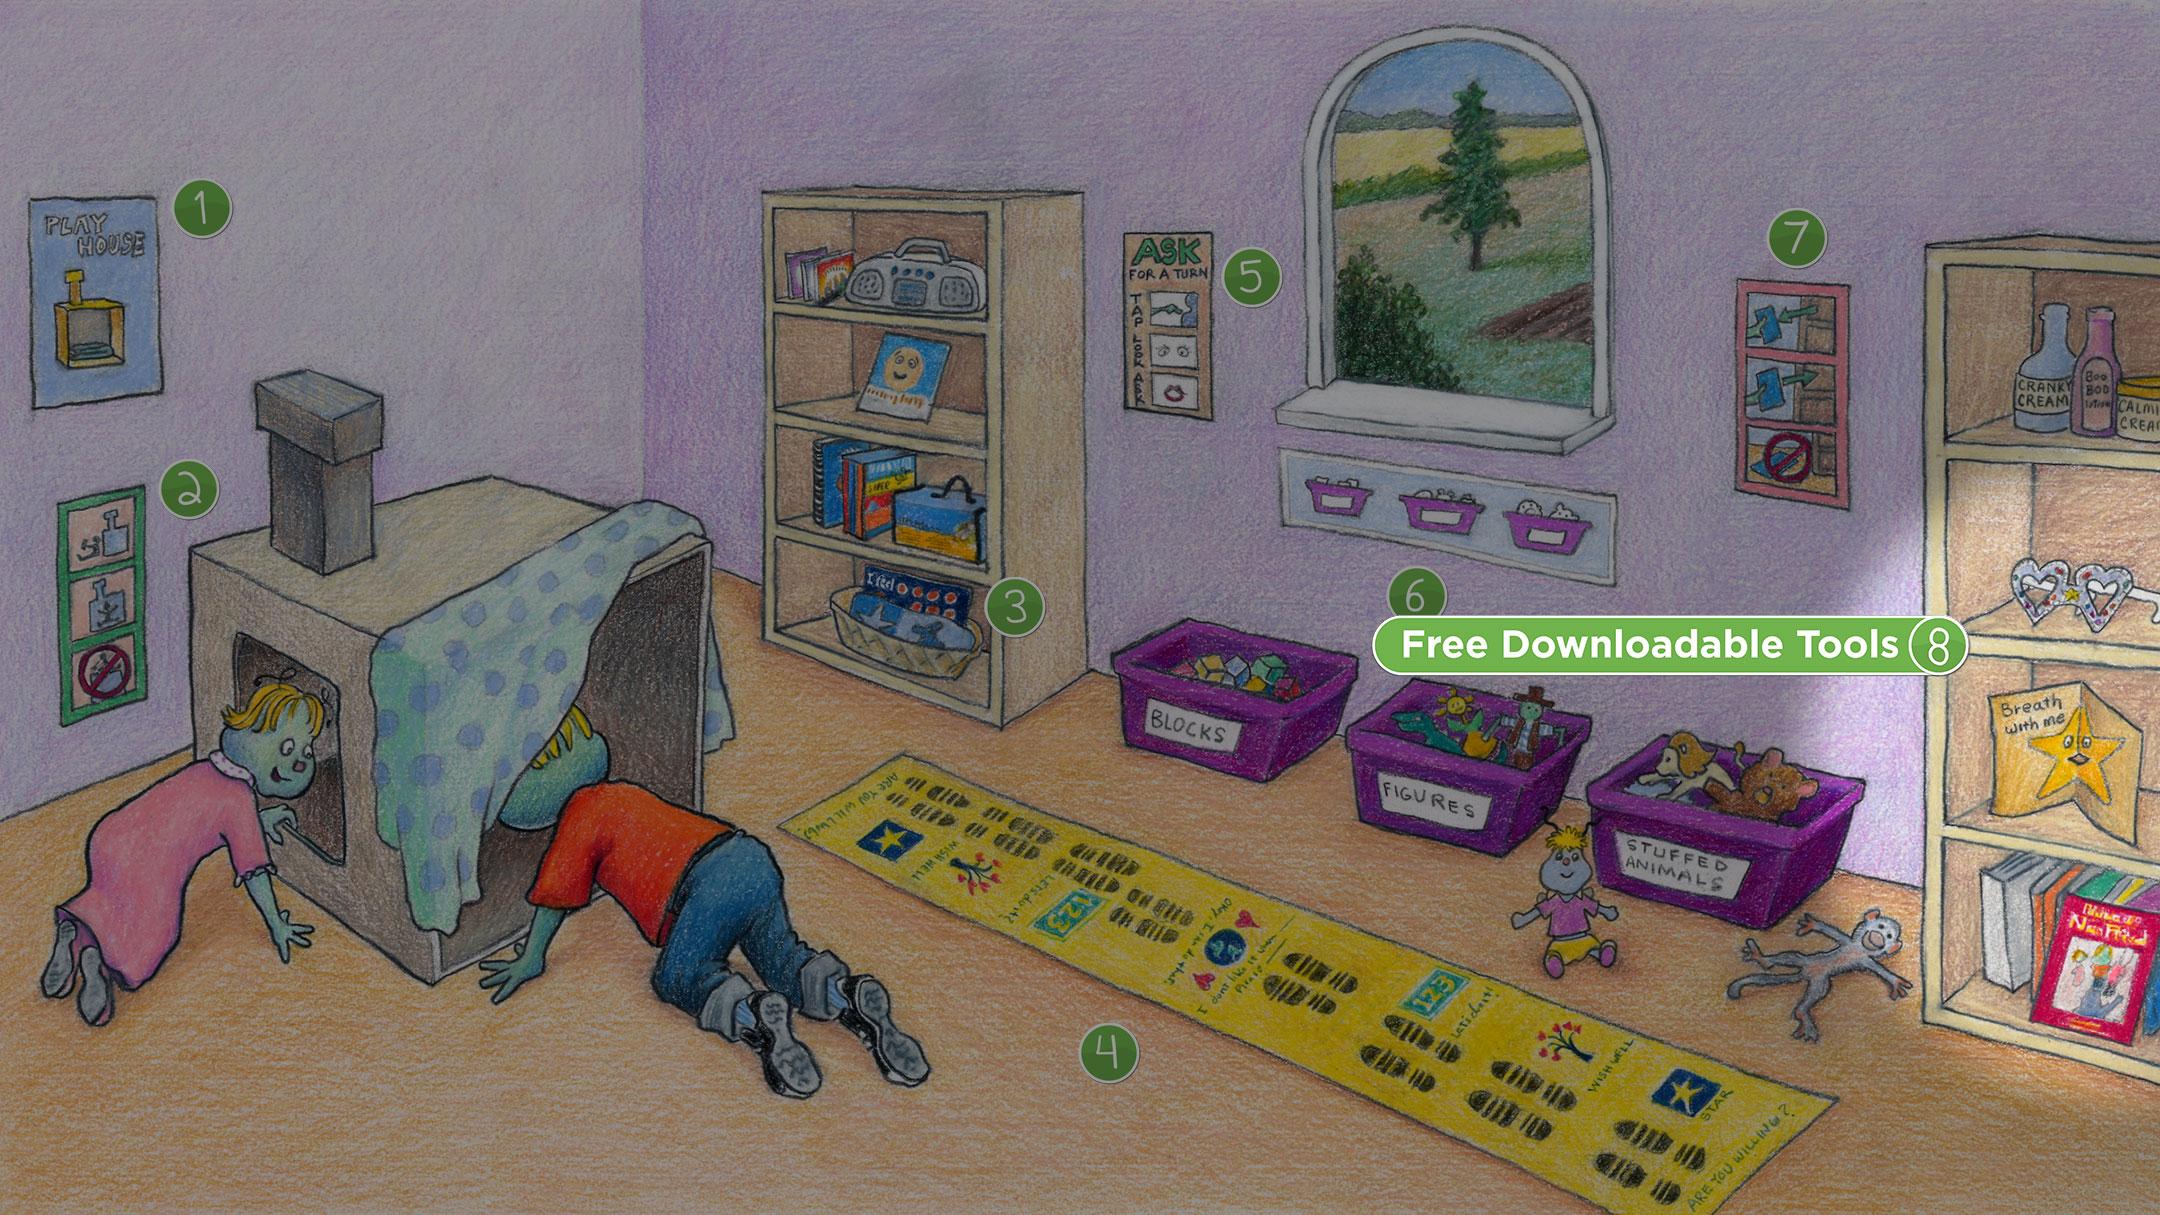 Playroom: Free Downloadable Tools